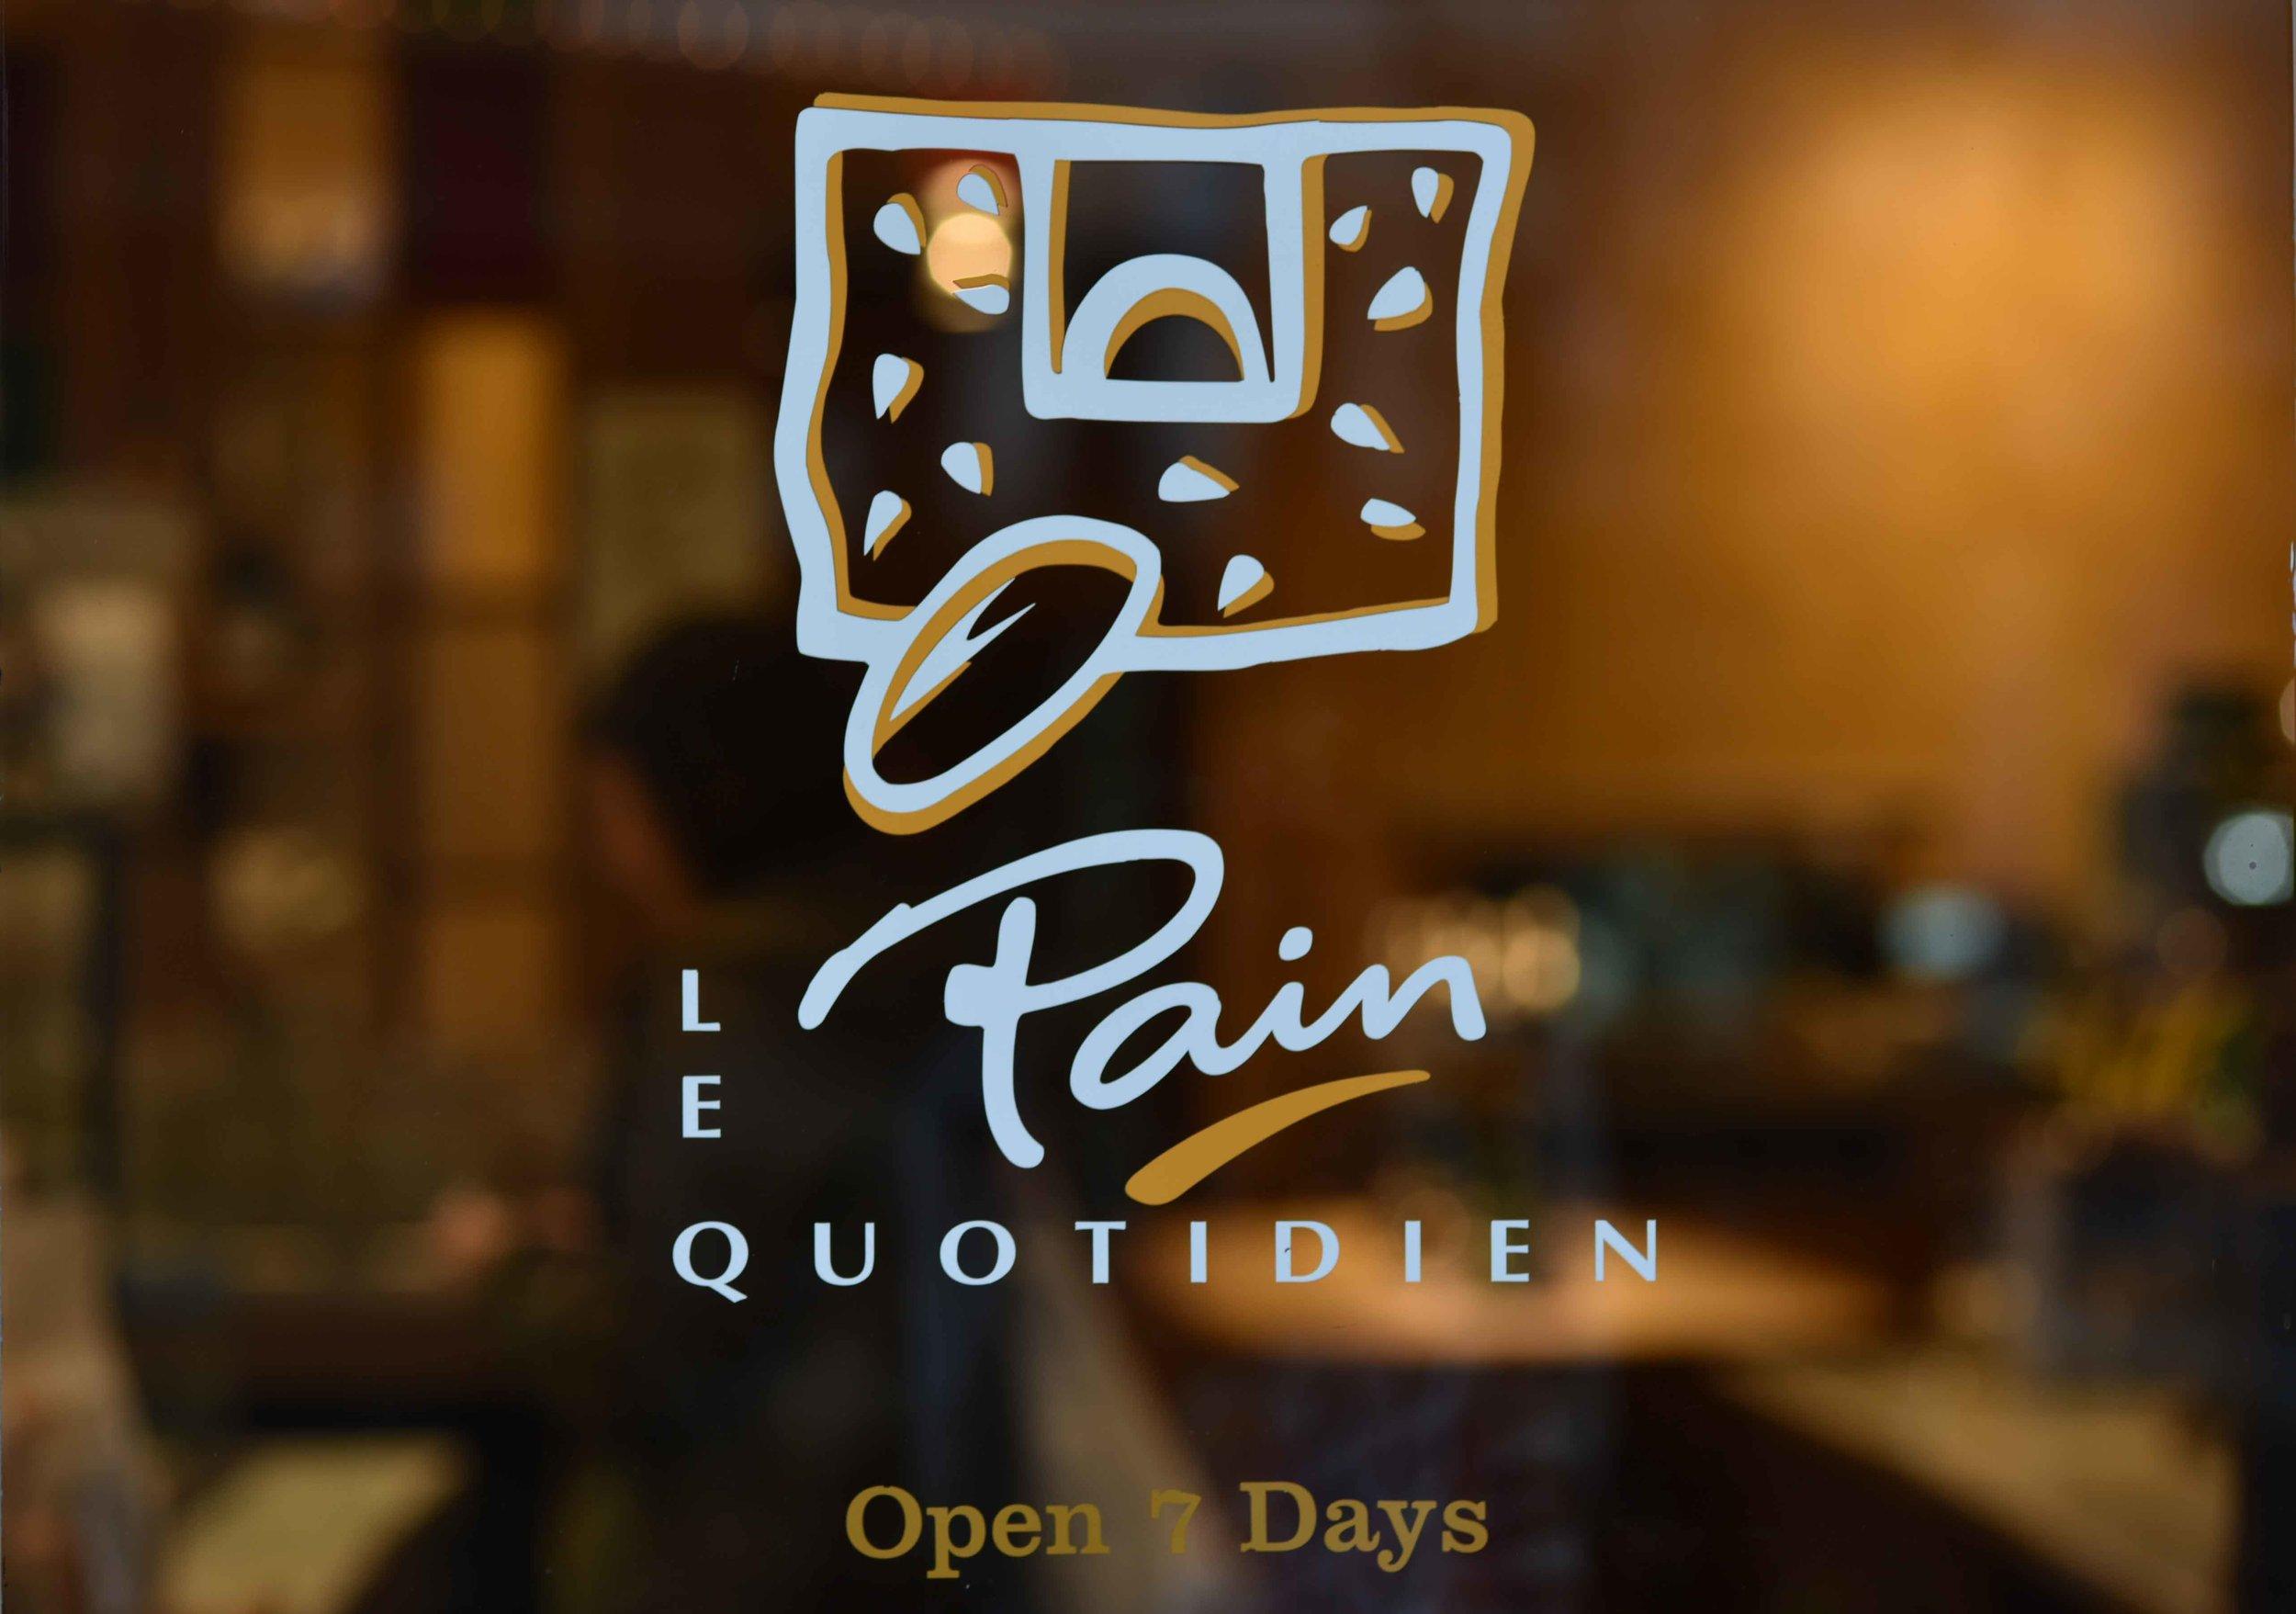 Le Pain Quotidien, bakery-restaurant, international chain. Image©thingstodot.com